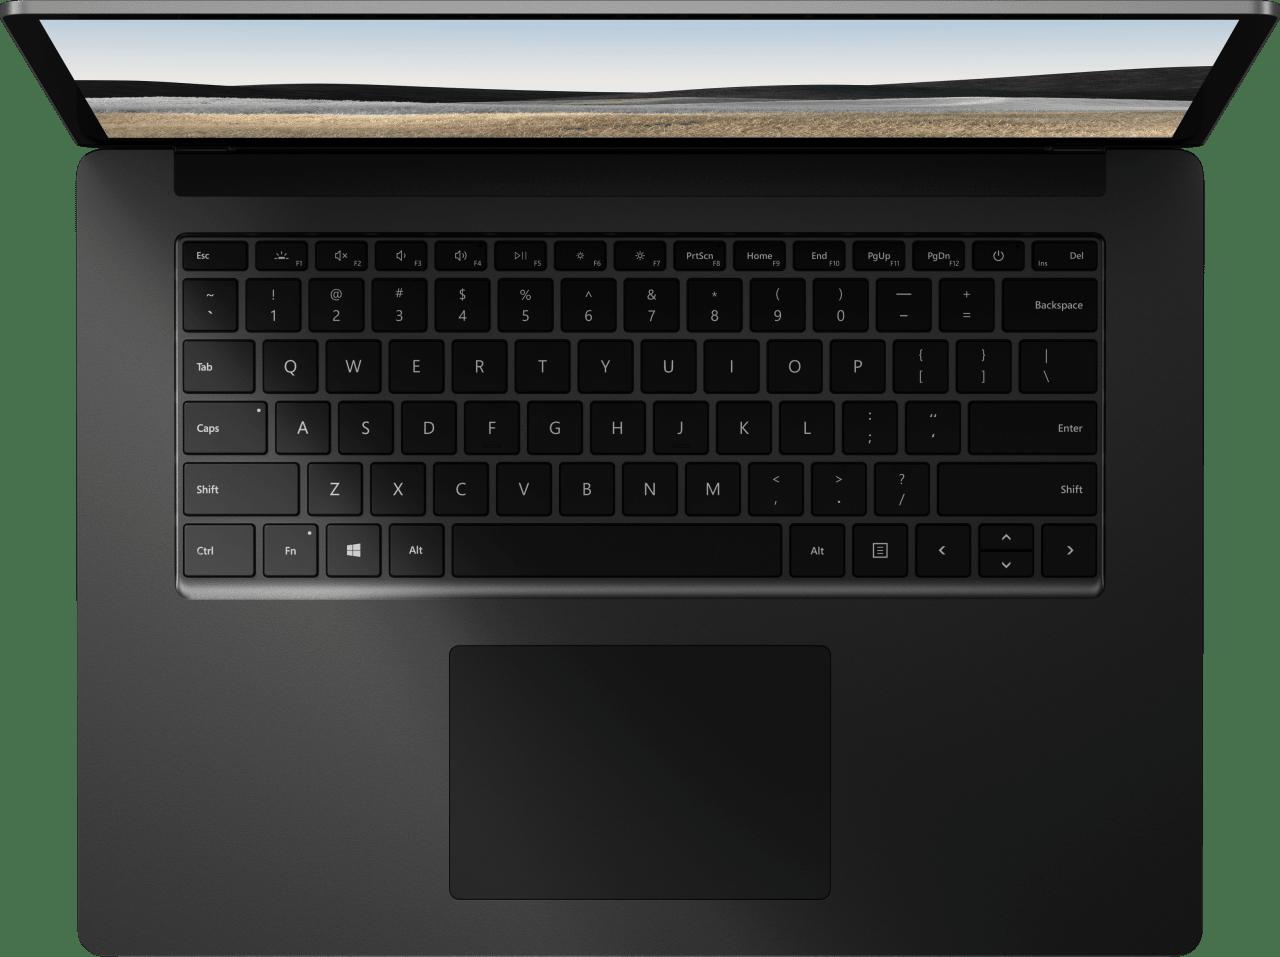 Black (Metal) Microsoft Surface Laptop 4 Laptop - Intel® Core™ i7-1185G7 - 32GB - 1TB SSD - Intel® Iris® Plus 950 Graphics.3